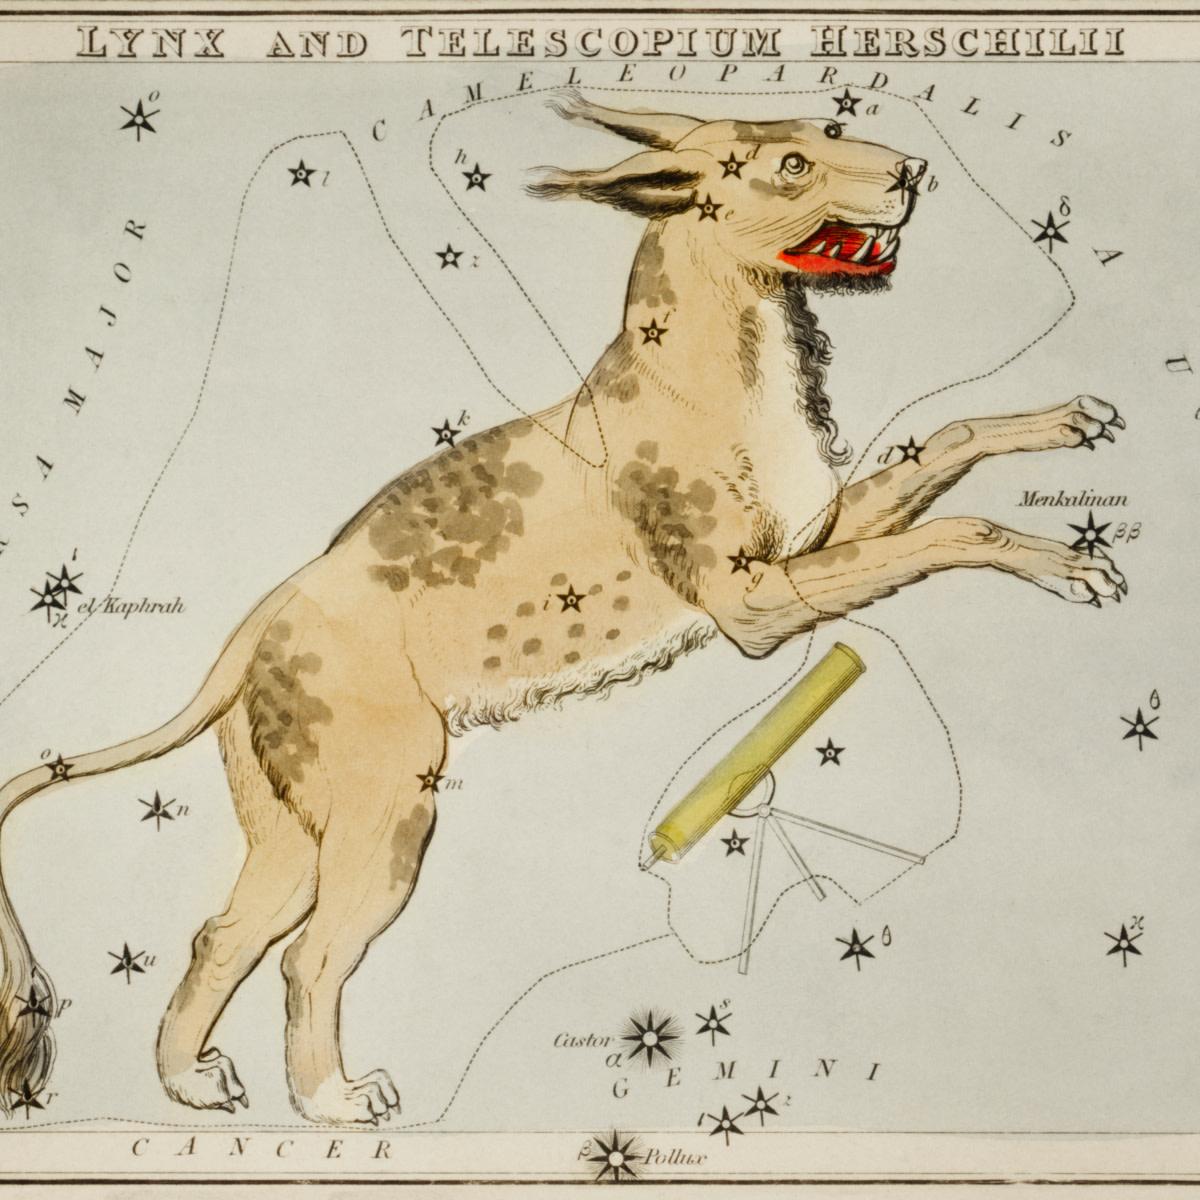 Sidney Hall's Lynx and the Telescopium Herschilii.